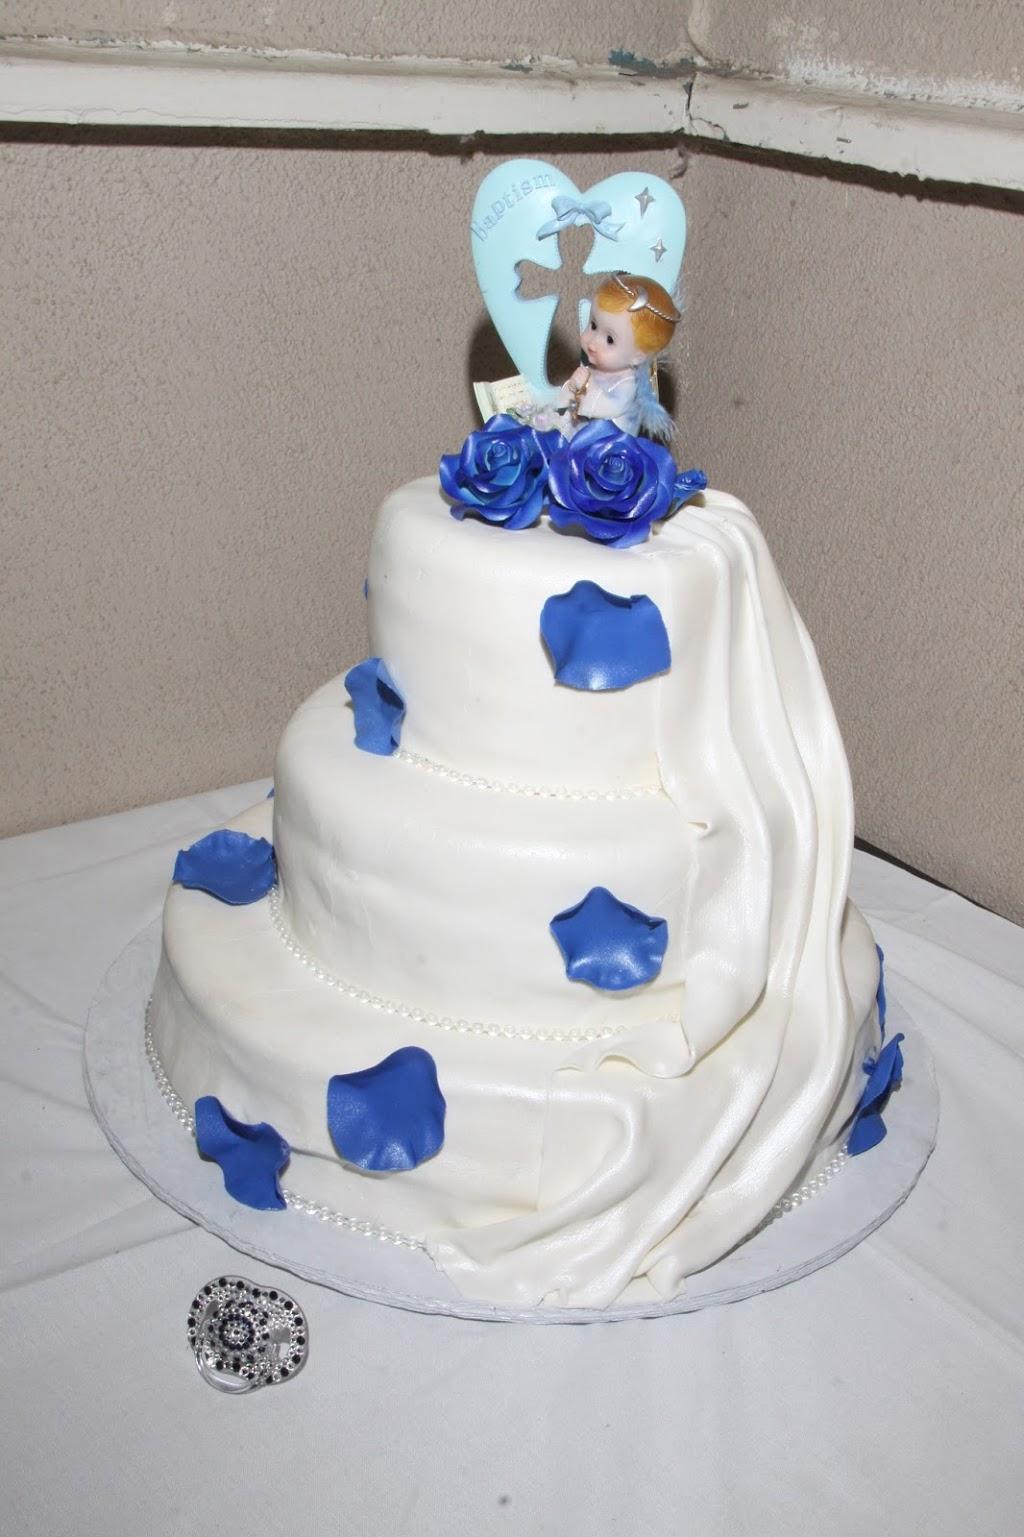 Las Tres Princesas Bakery - bakery  | Photo 4 of 7 | Address: 2736 N Bristol St, Santa Ana, CA 92706, USA | Phone: (714) 542-2131